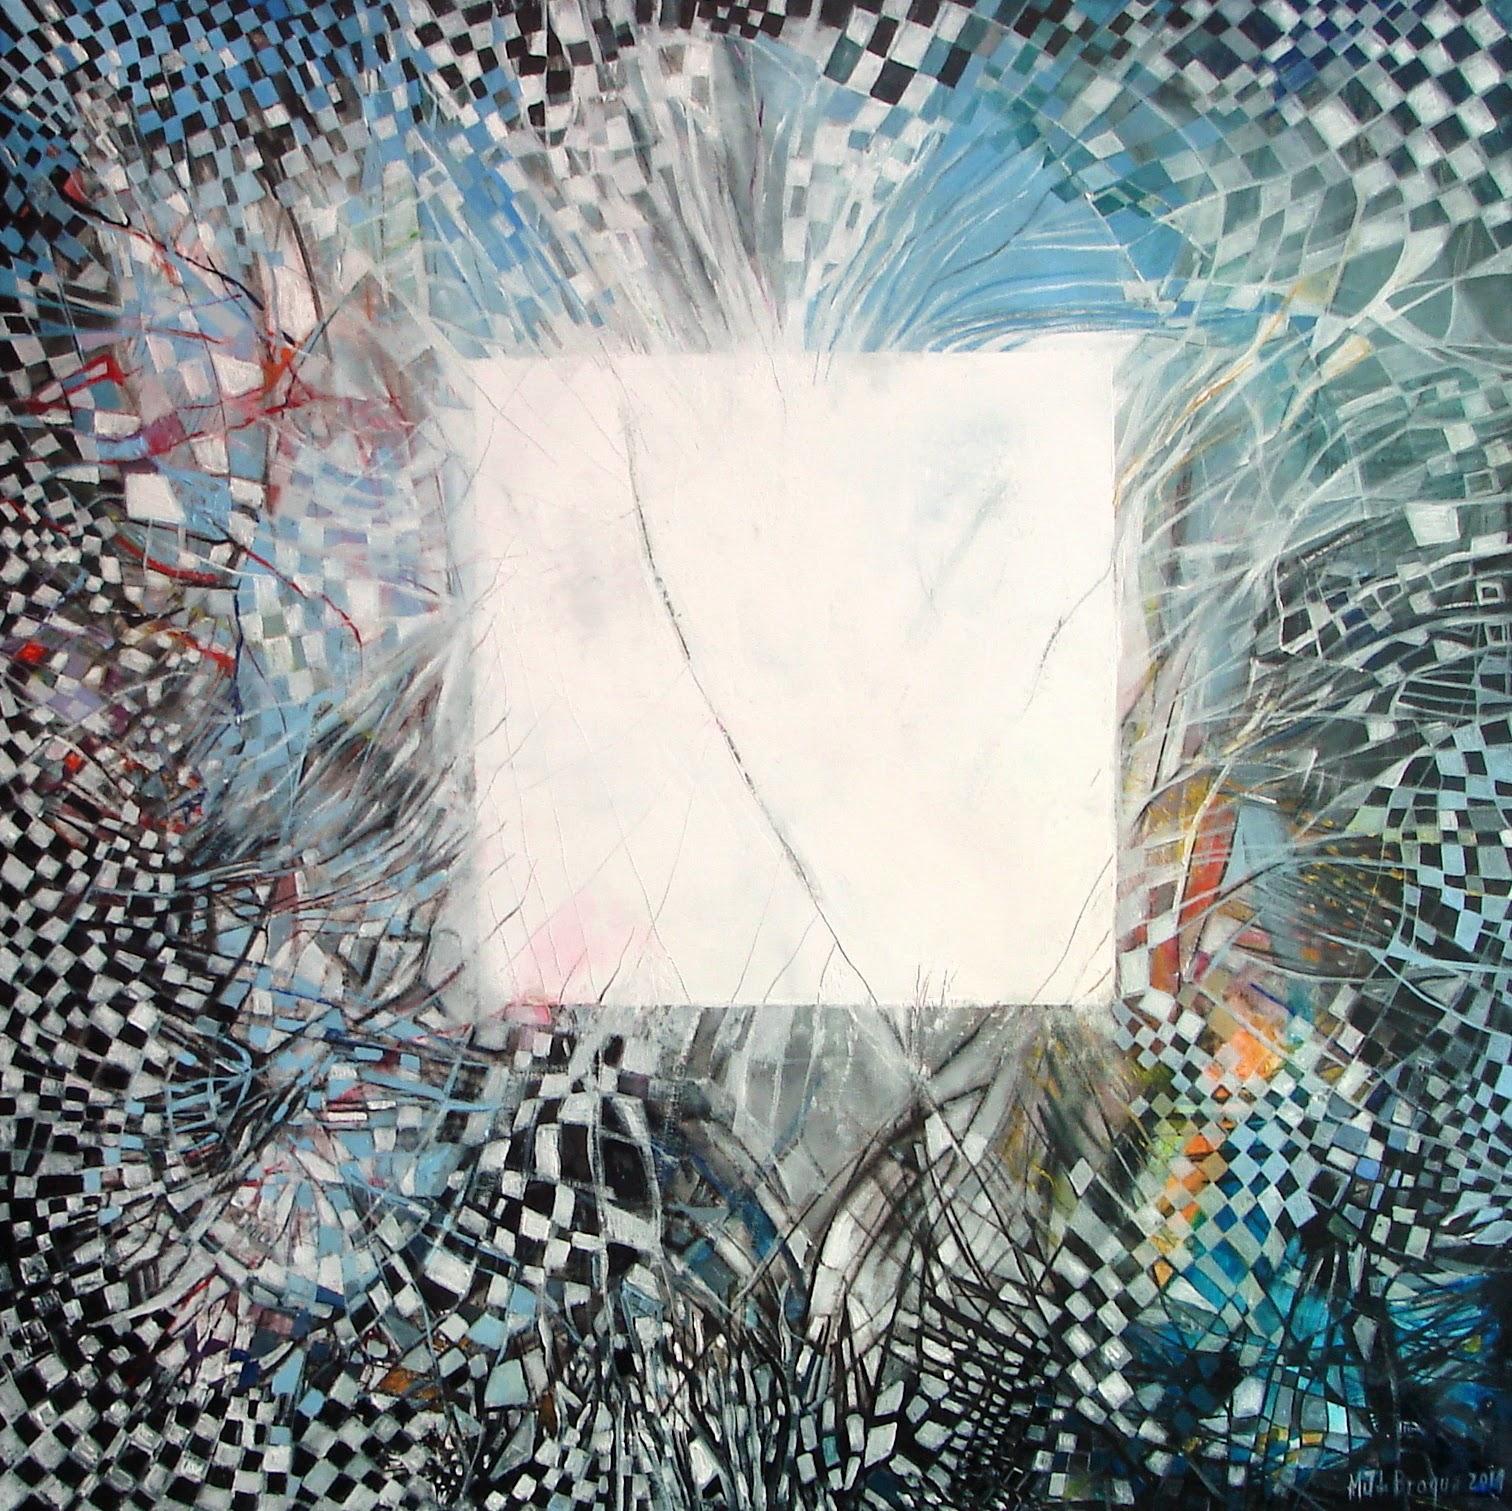 Conscience 2 - 80 x 80 cm - 2014